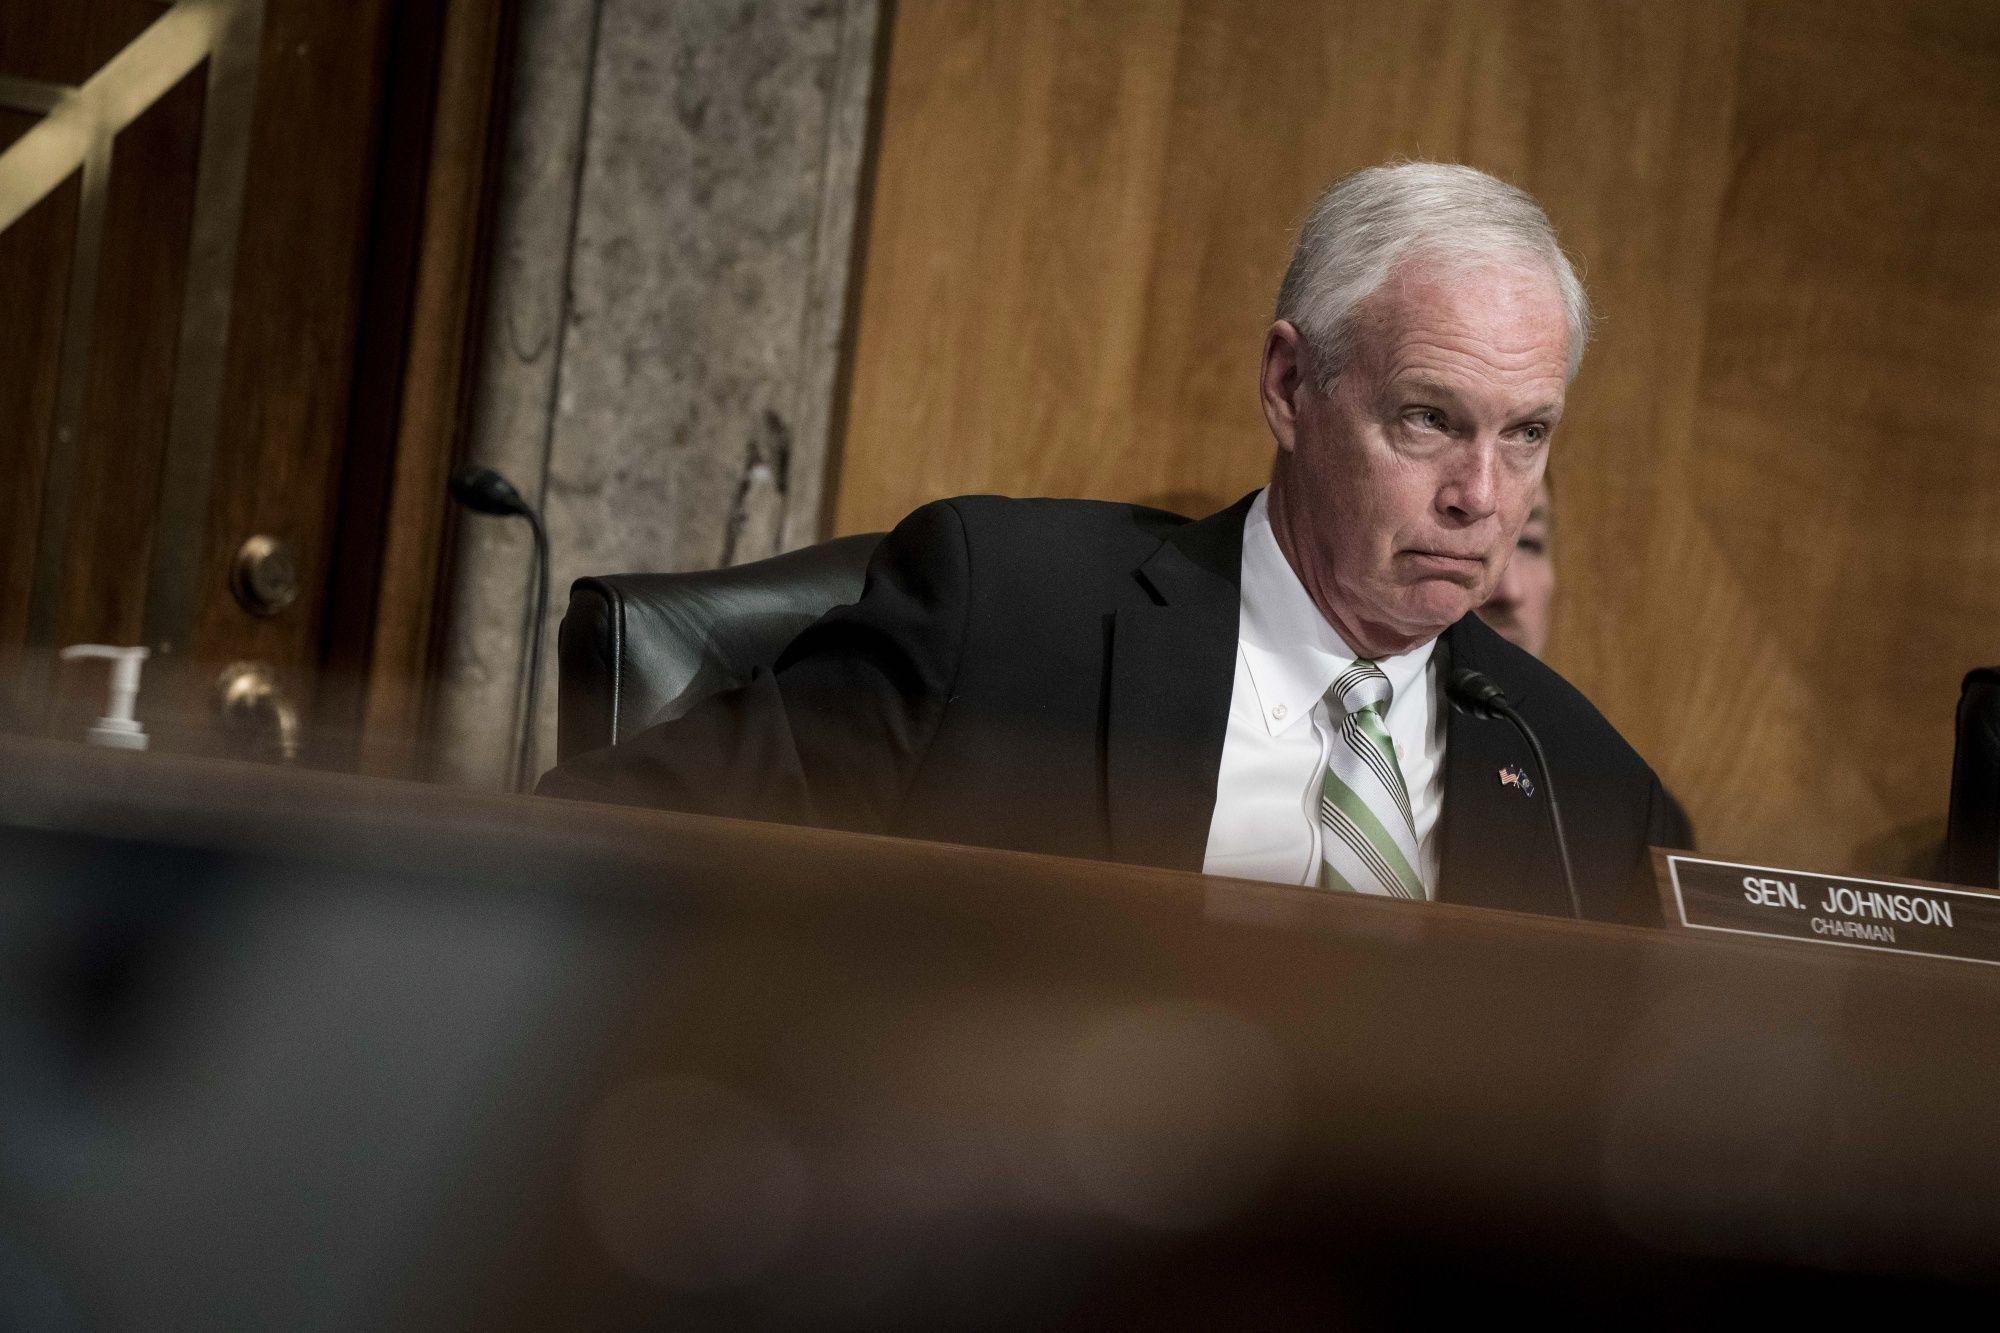 Senate Homeland Security Committee On Federal Interagency Response To The Coronavirus